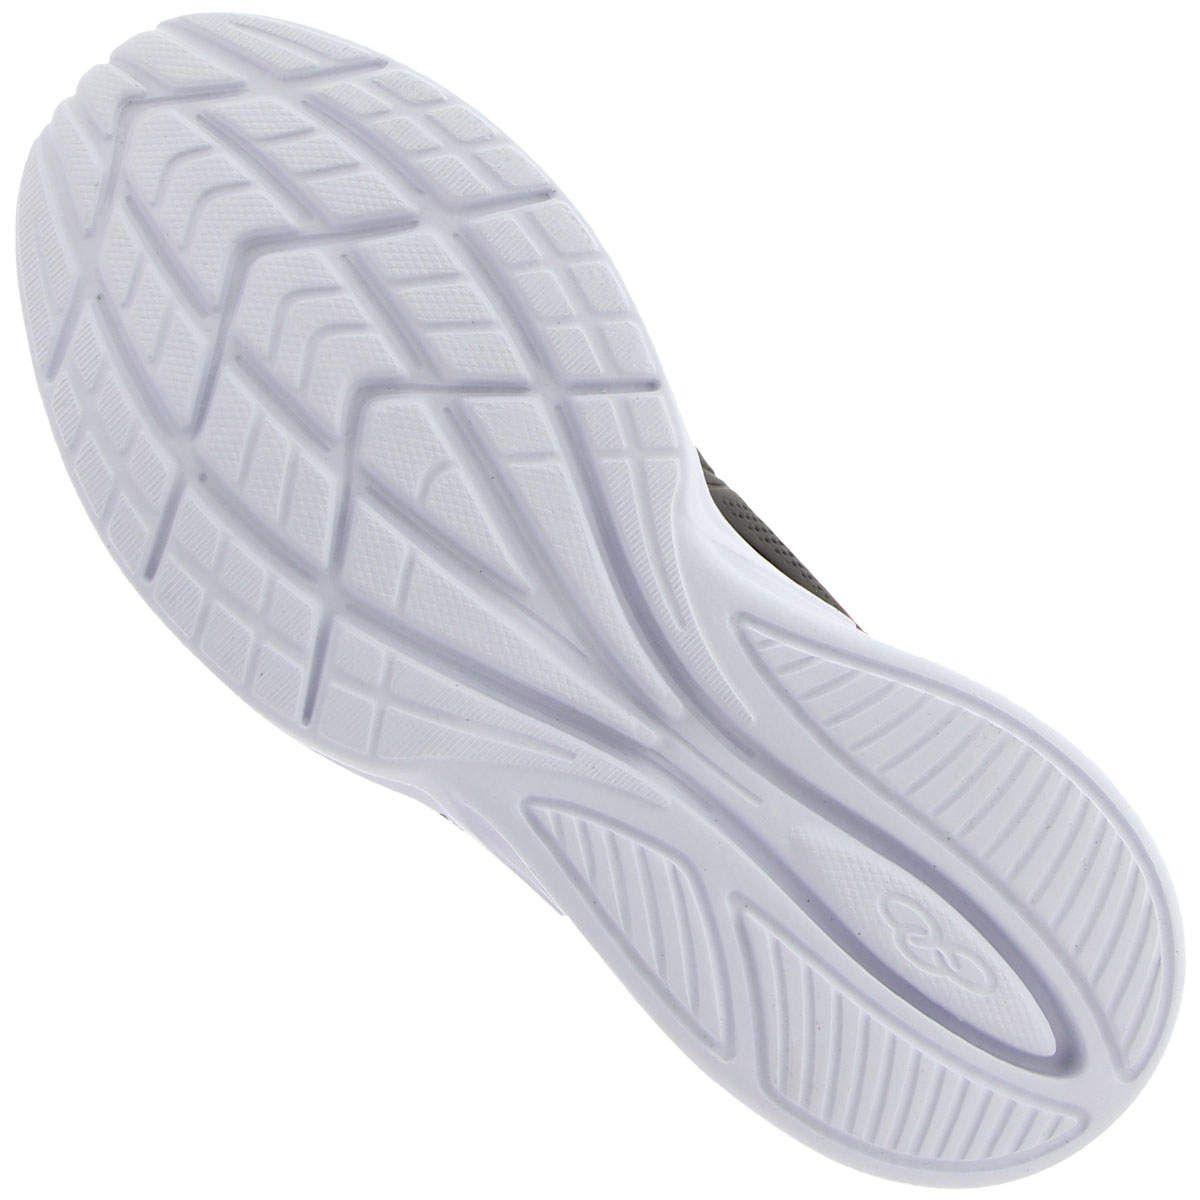 Tenis Olympikus Fluence Conforto Caminhada - 416022508